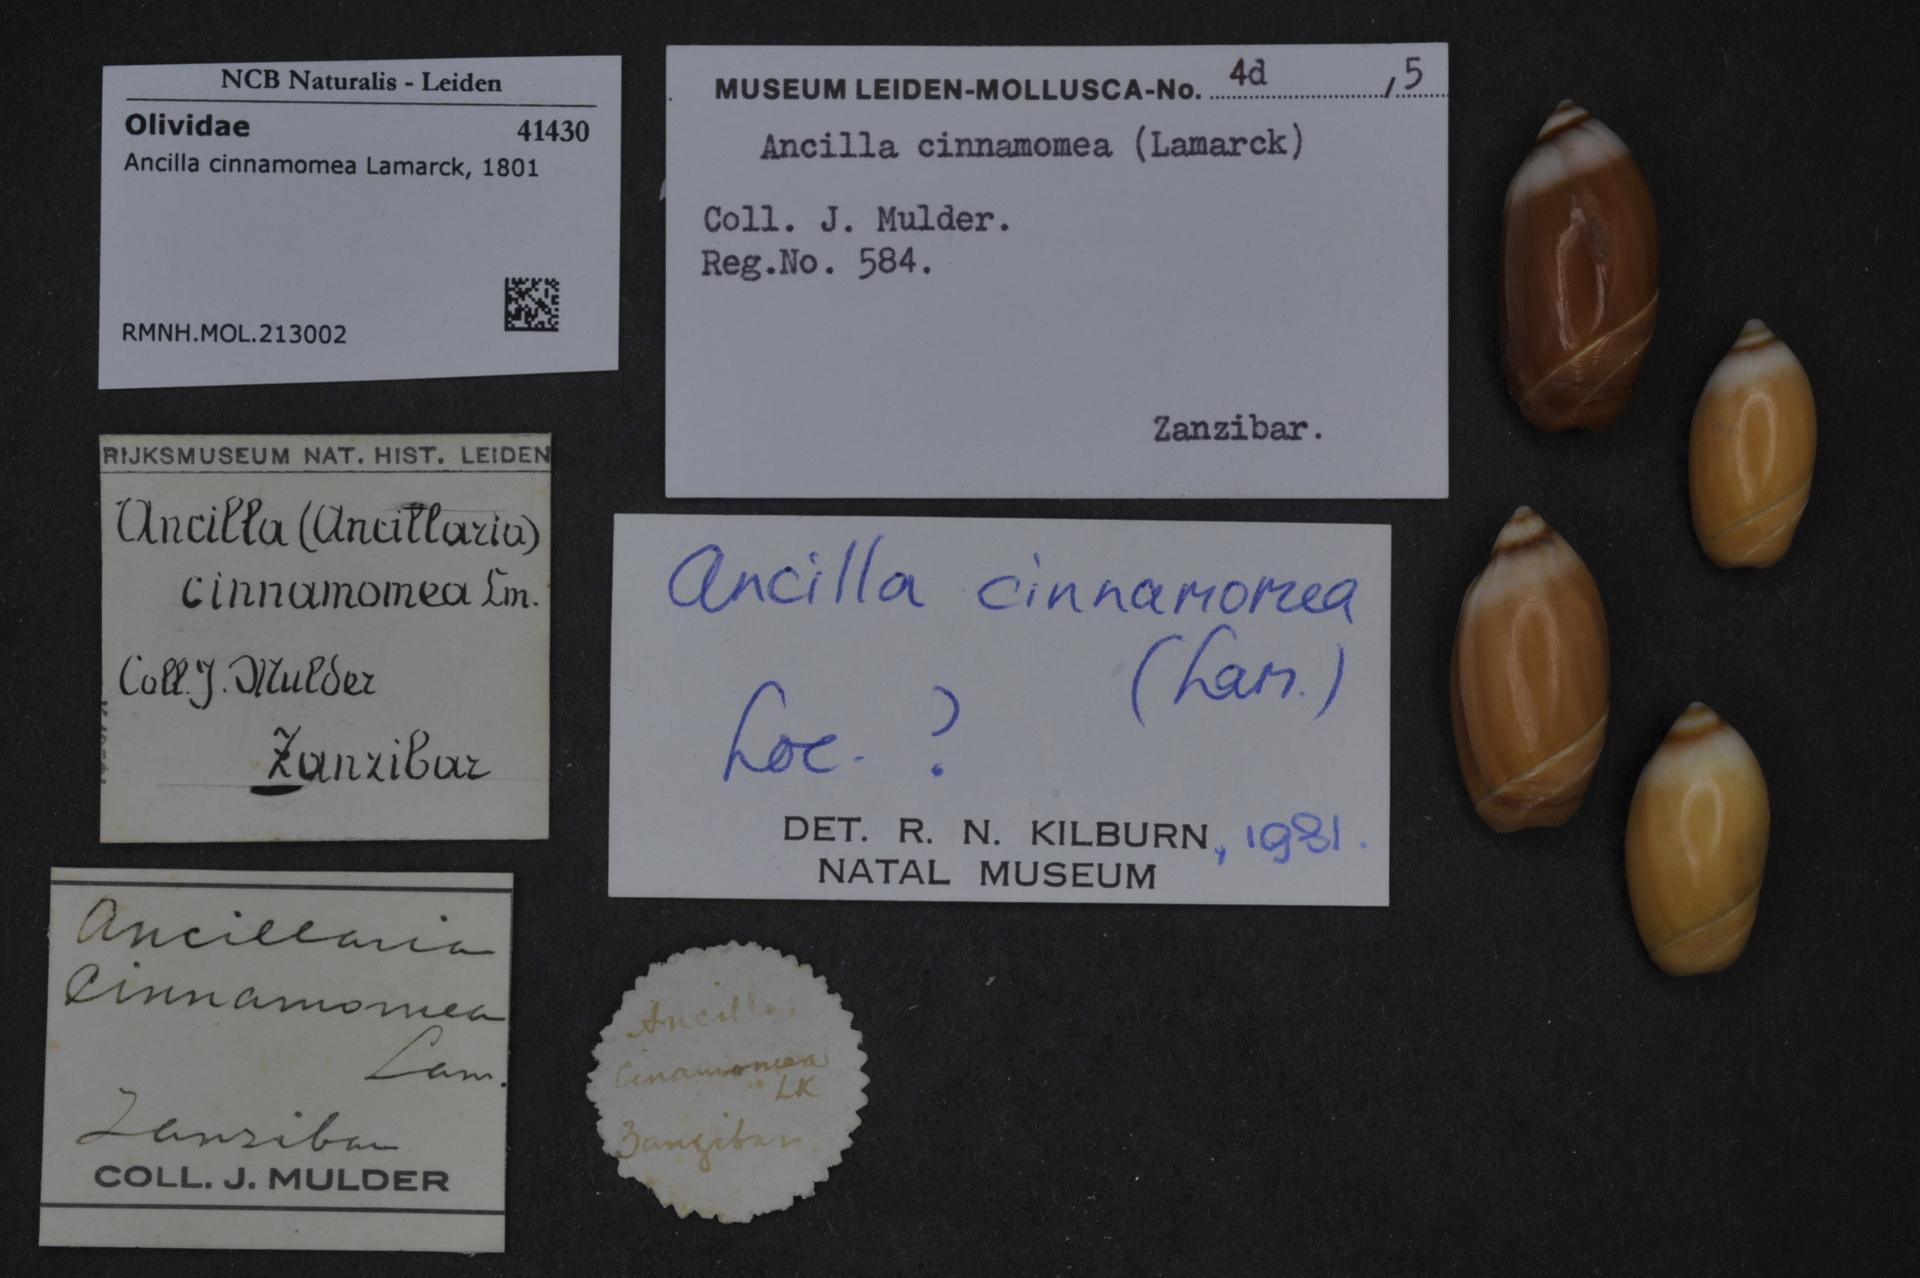 Image of cinnamon ancilla